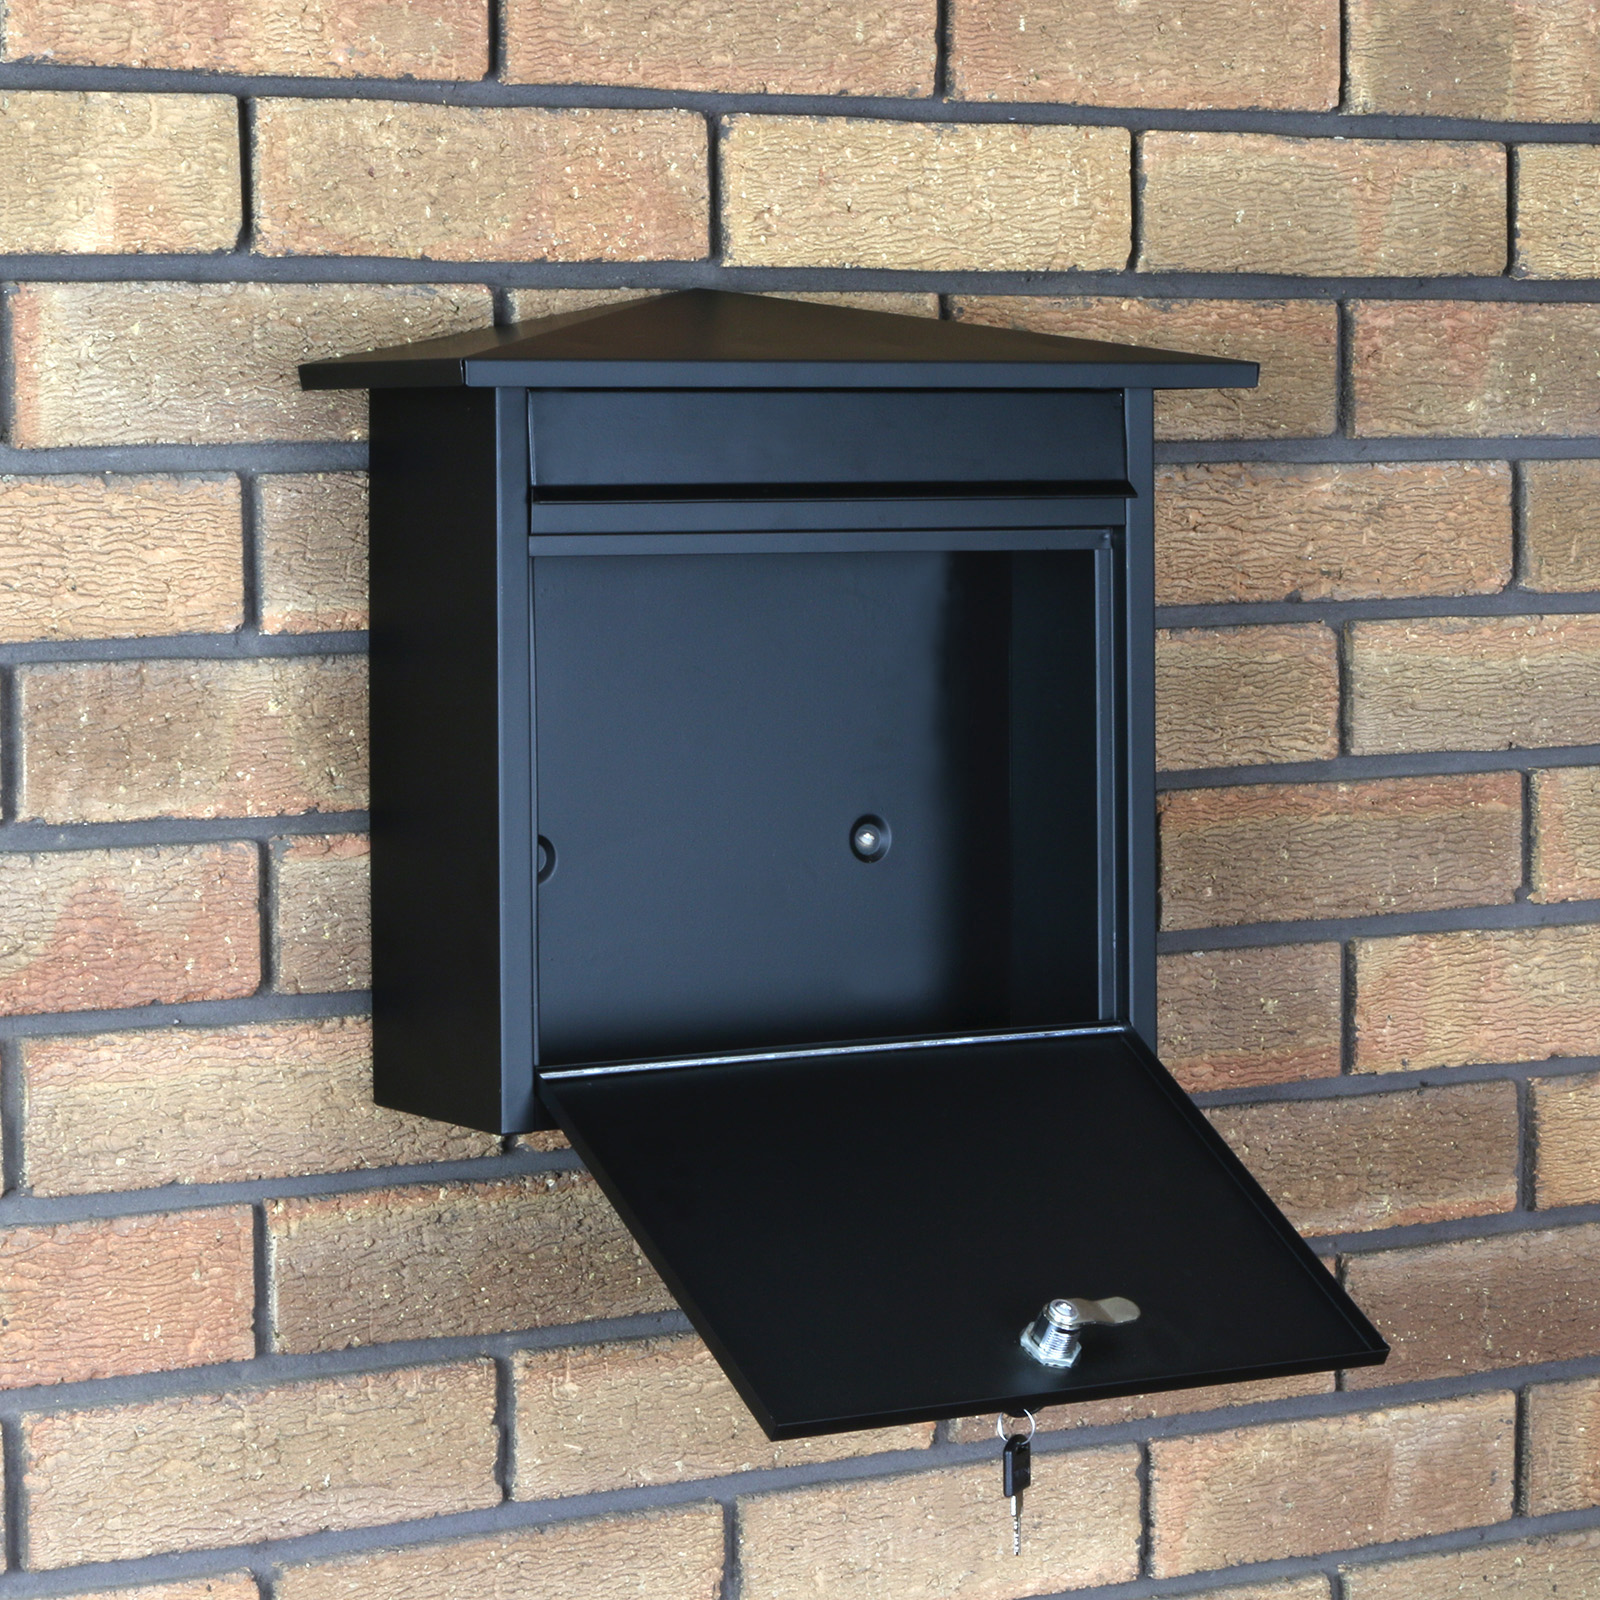 Matt Black Lockable Mailbox/Postbox Outdoor Home Wall Mail